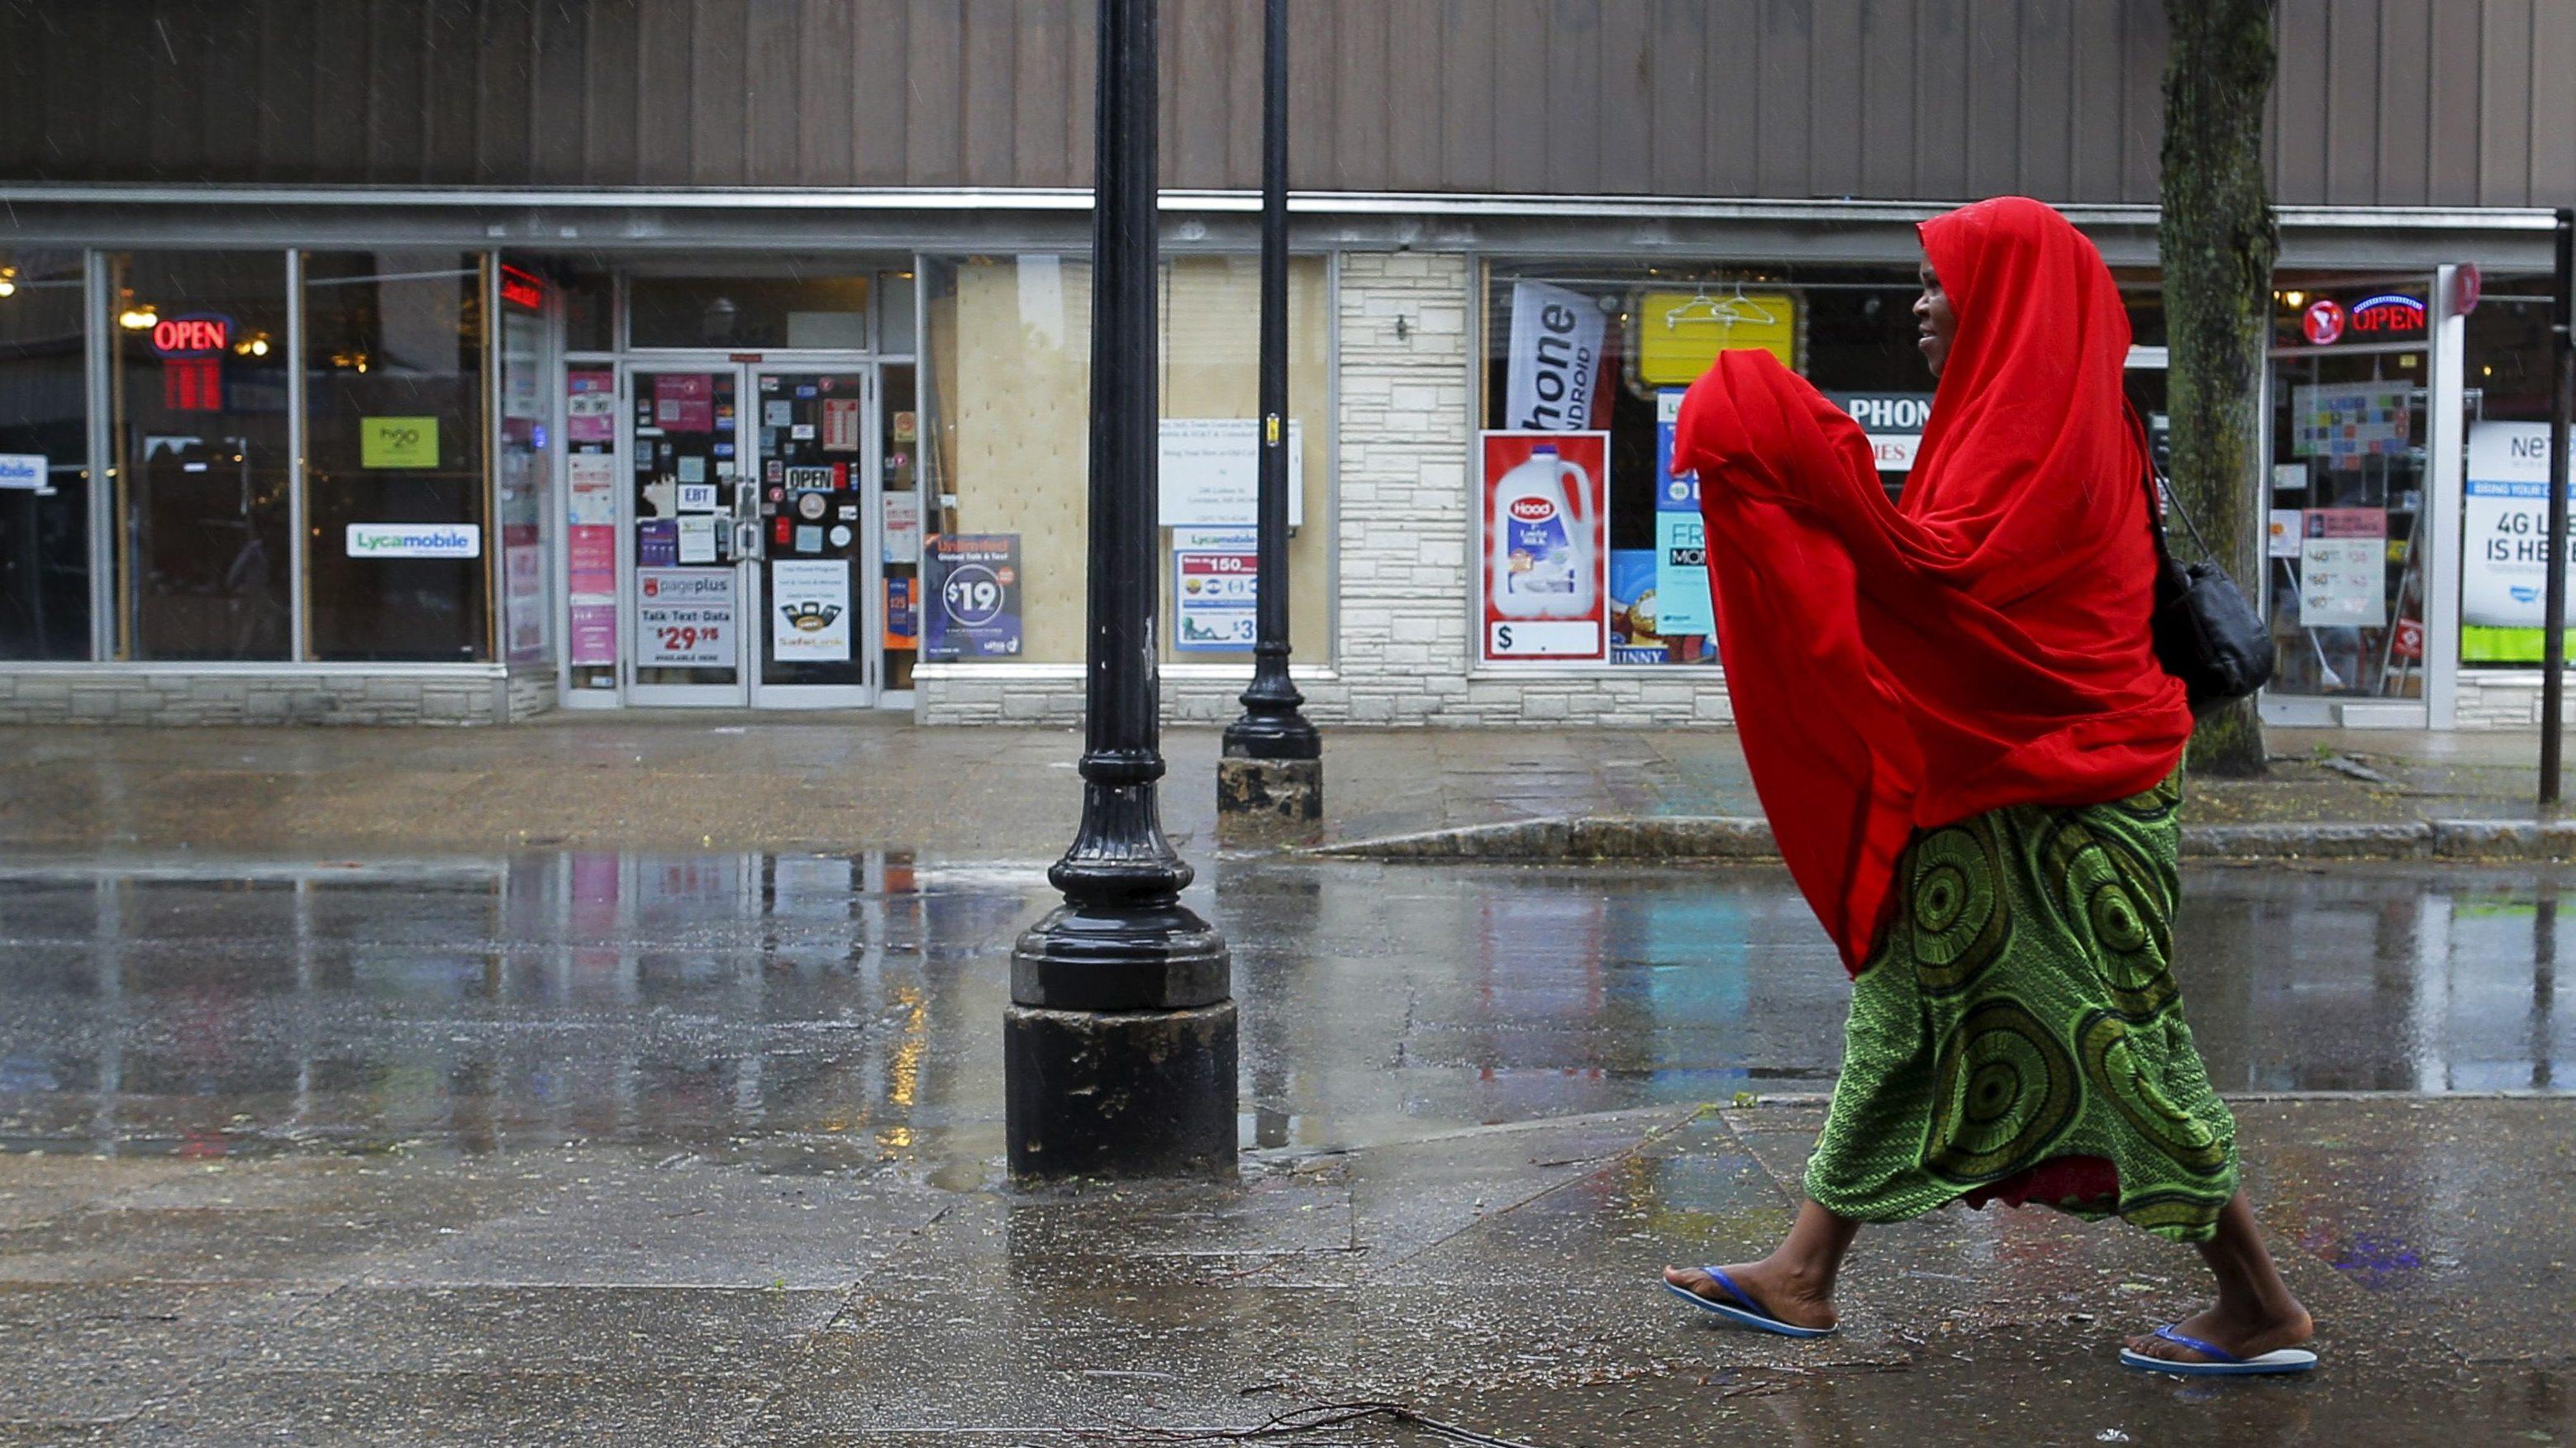 A Somali woman walks along a street in downtown Lewiston, Maine.